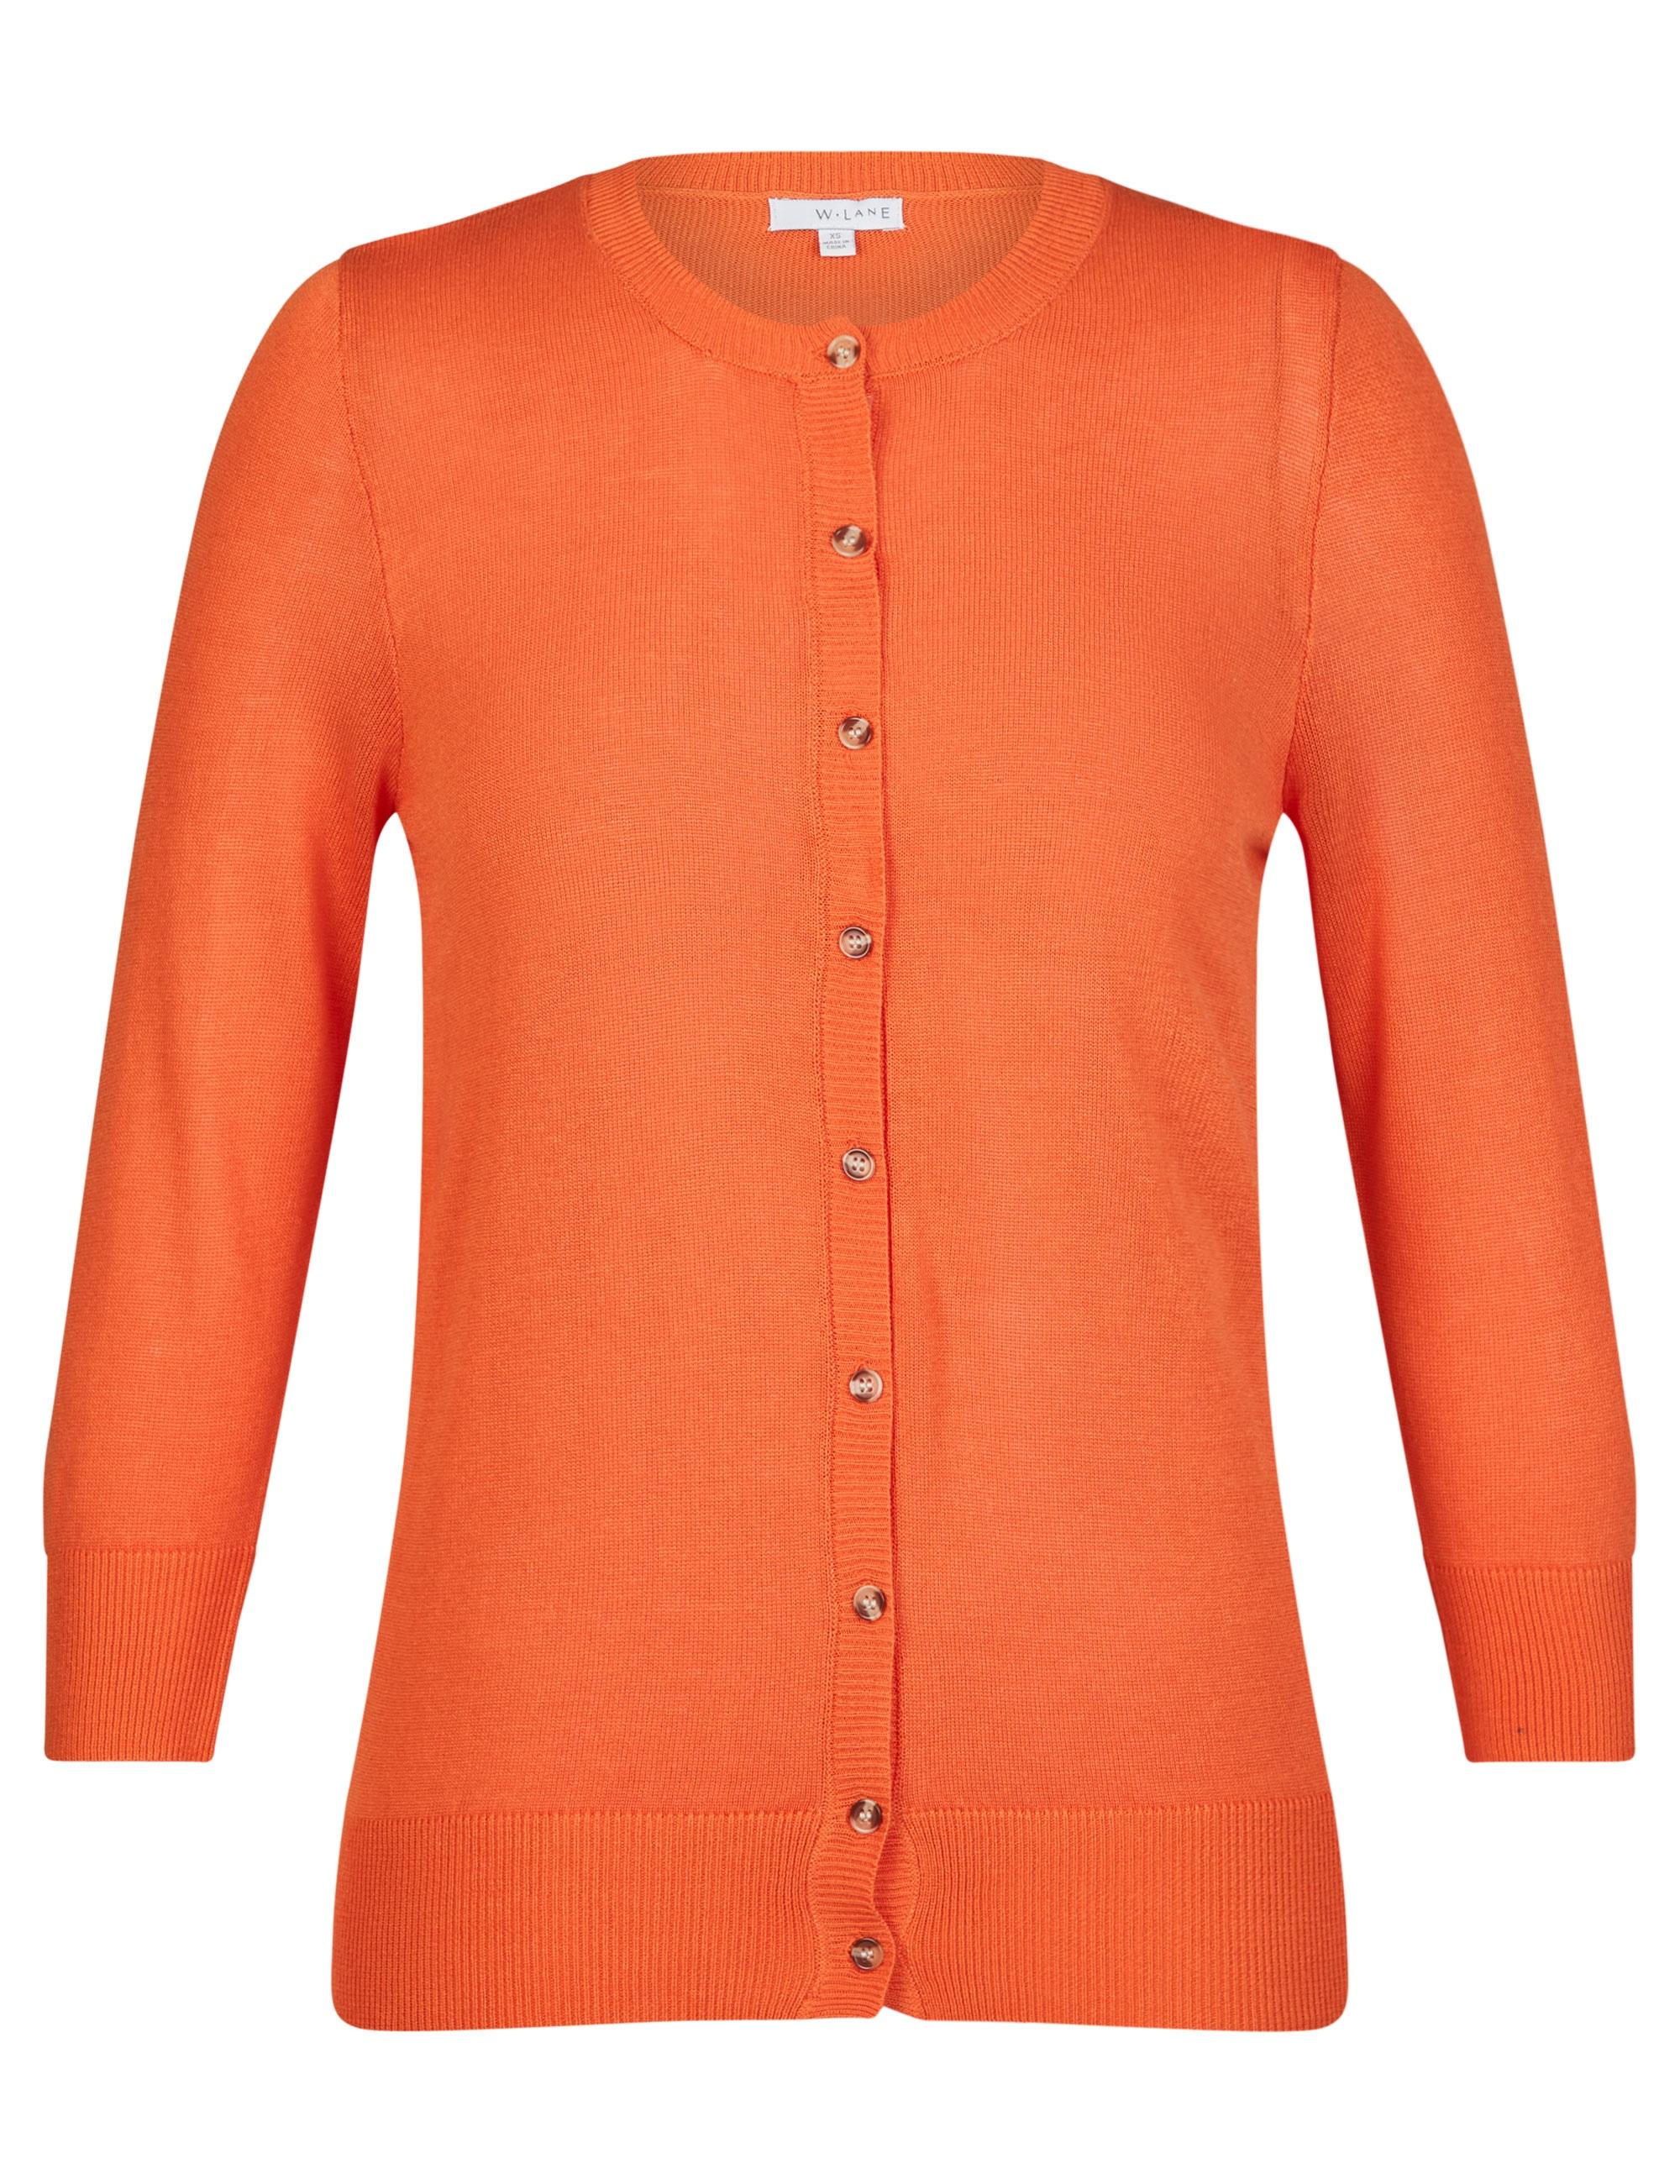 1055564801 2 - Women Fashion